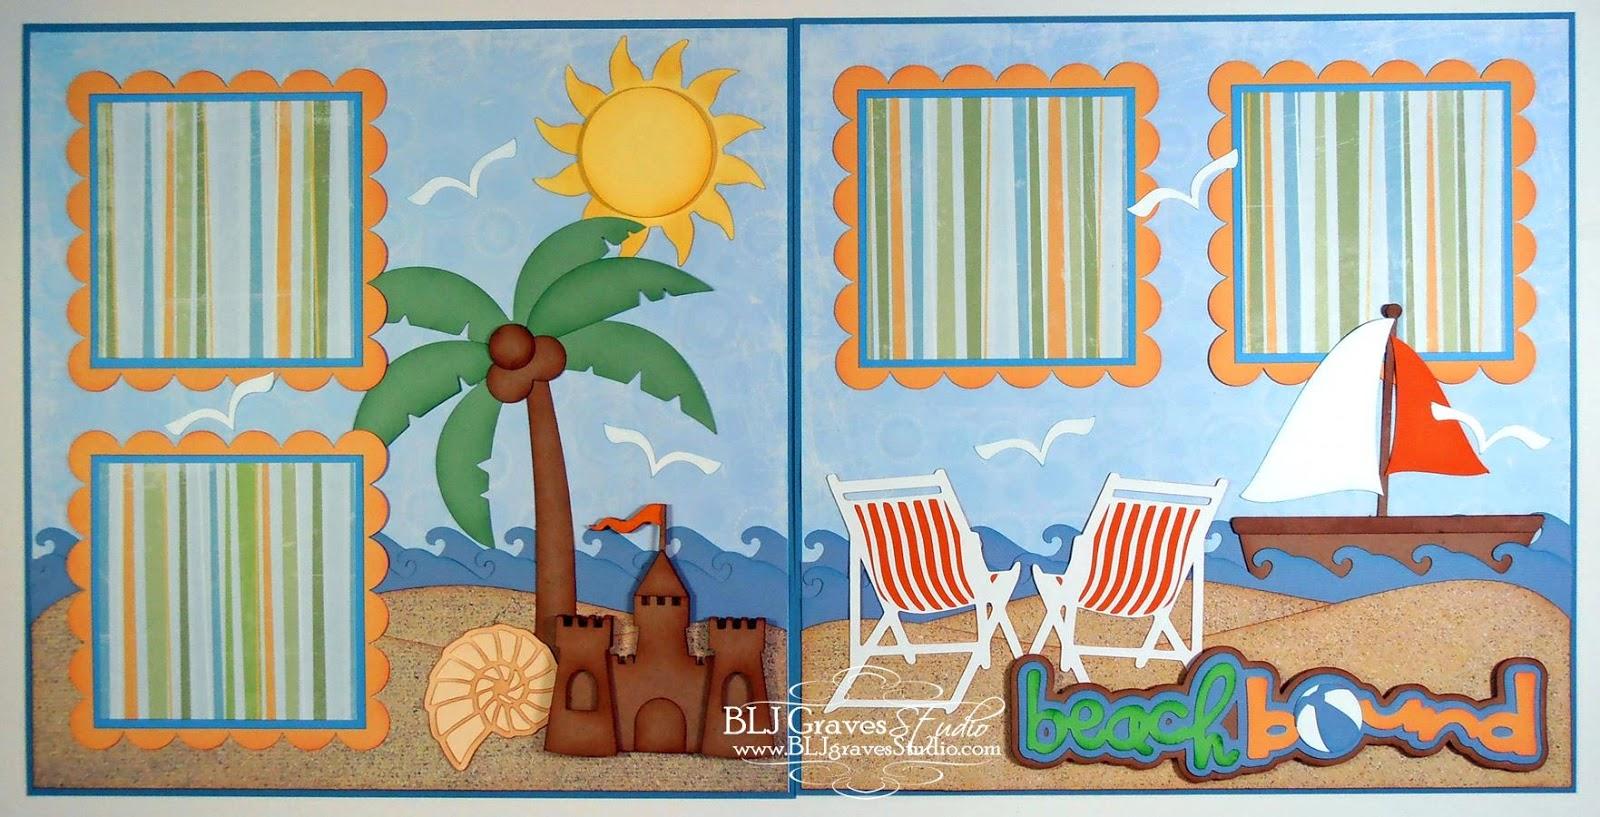 Blj Graves Studio Beach Bound Vacation Summer Scrapbook Page